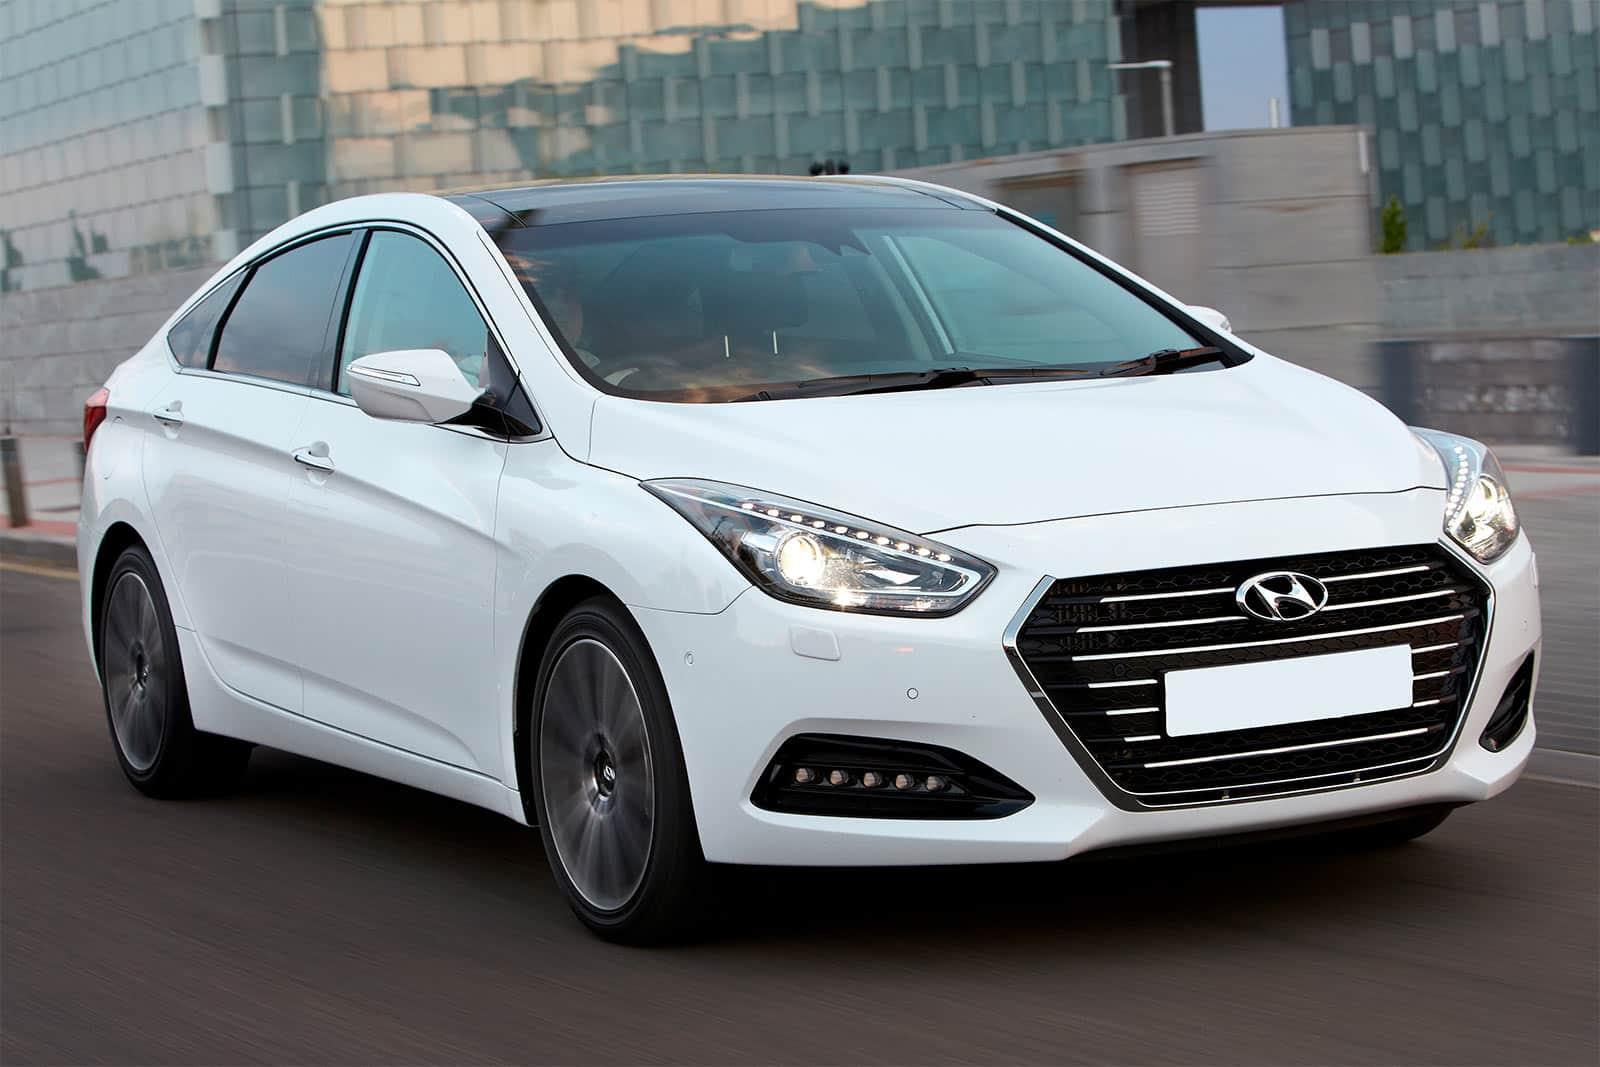 Hyundai i40 frontal